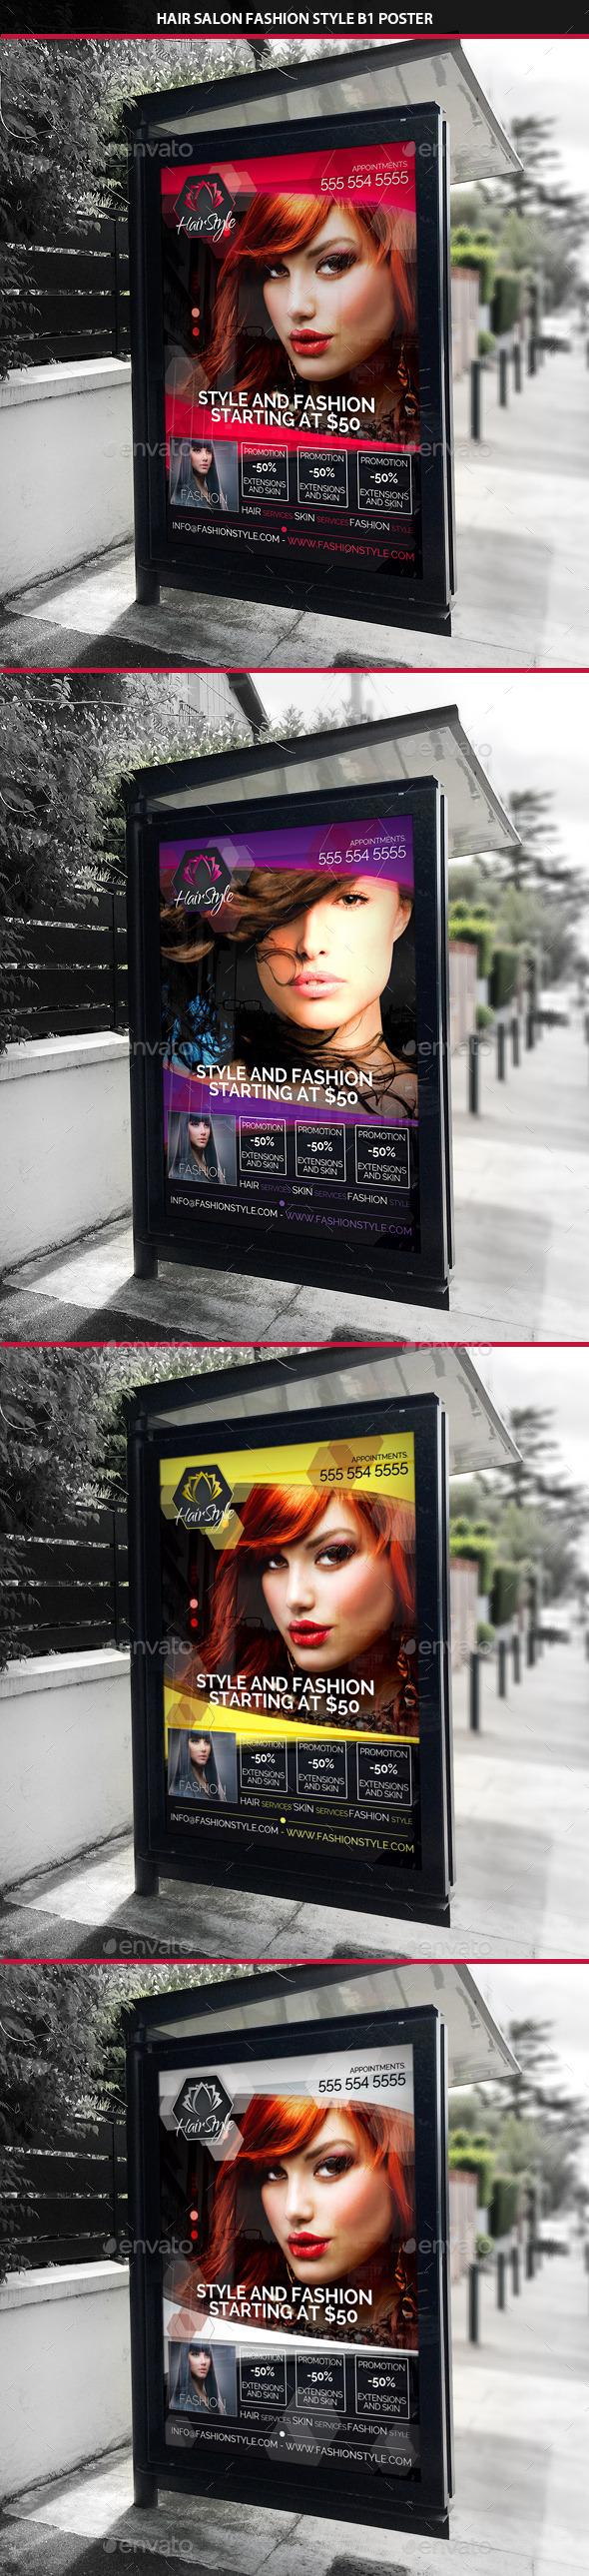 Hair Salon Fashion Style B1 Signage Poster - Signage Print Templates